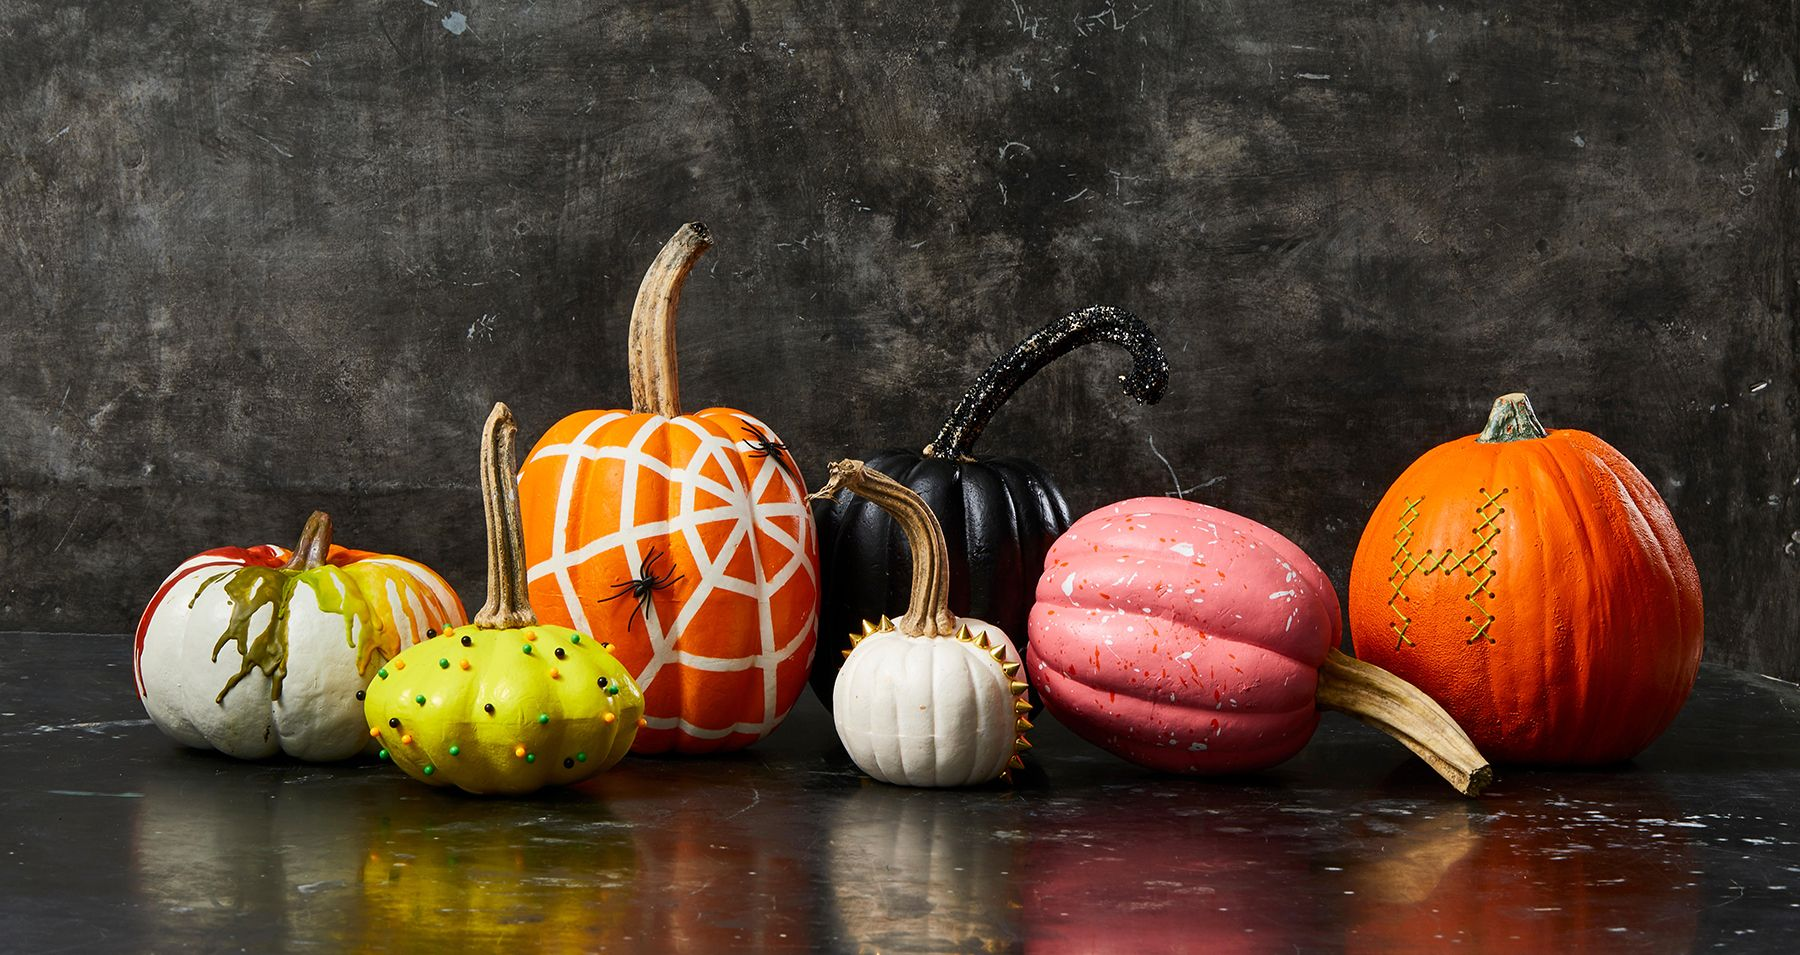 picture regarding Peanuts Pumpkin Printable Carving Patterns titled 60+ Simplest No-Carve Pumpkin Decorating Programs for Halloween 2019